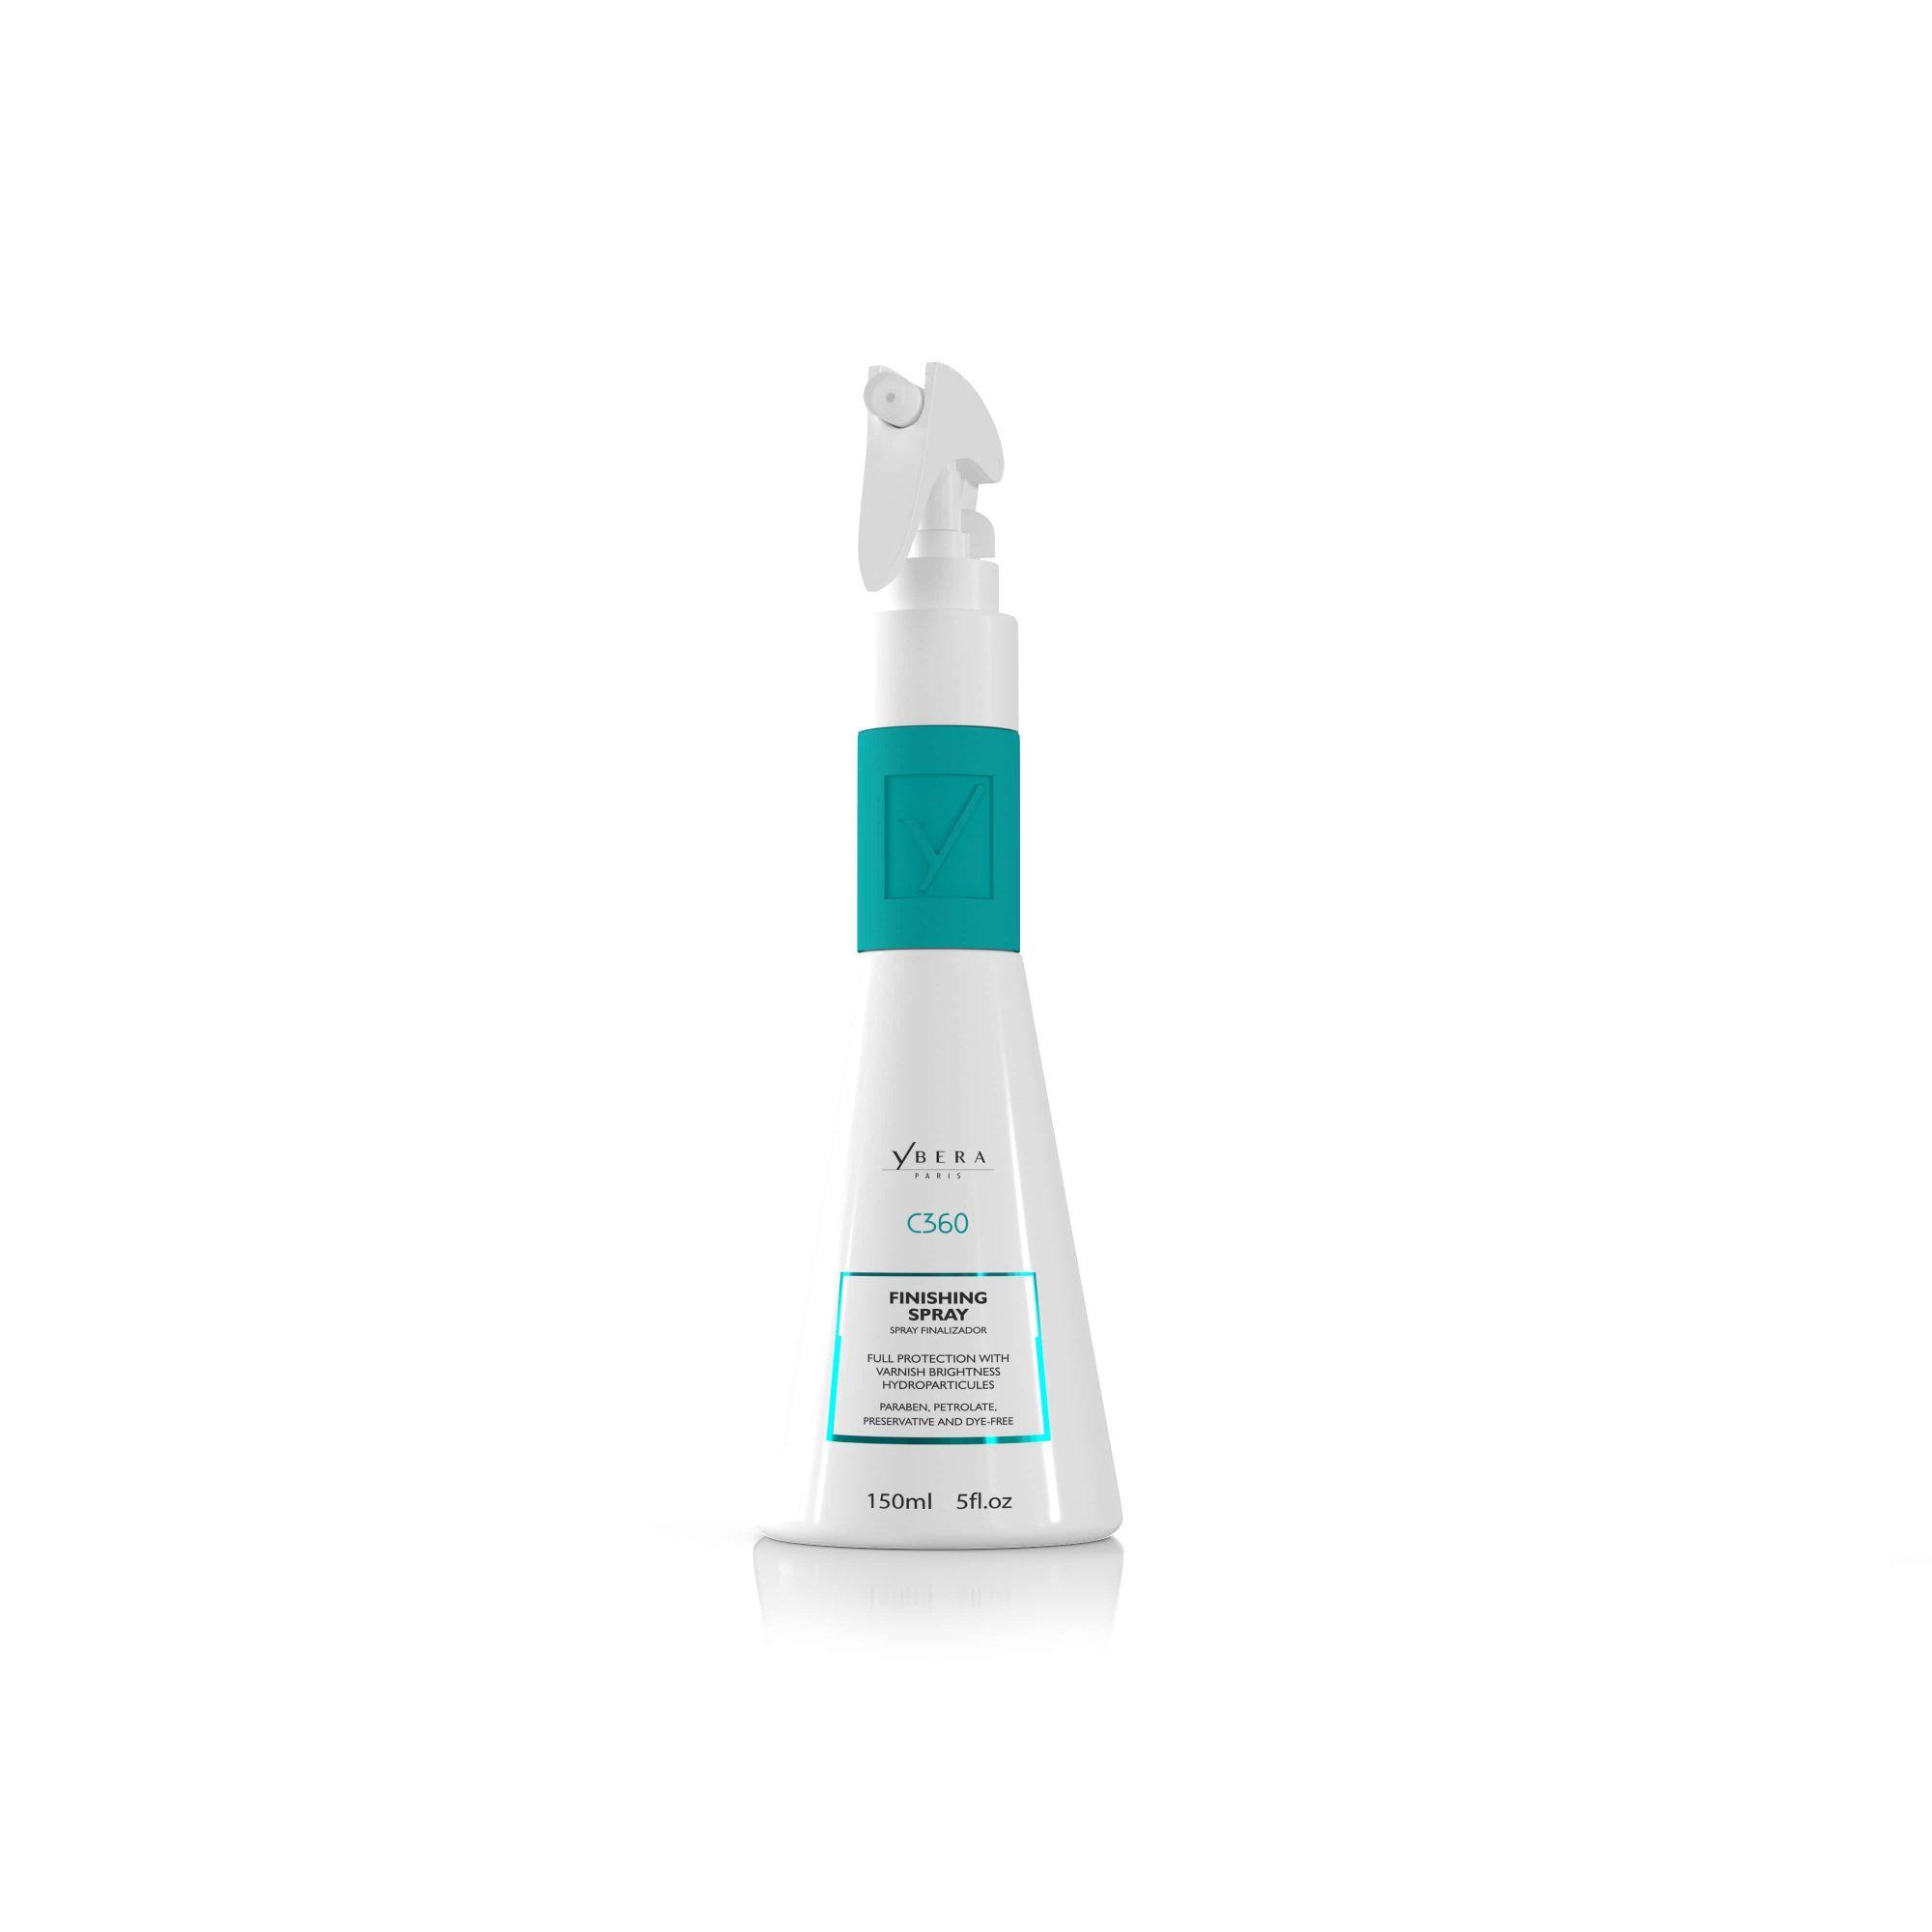 Spray Gloss C360 Ybera Paris 150ml